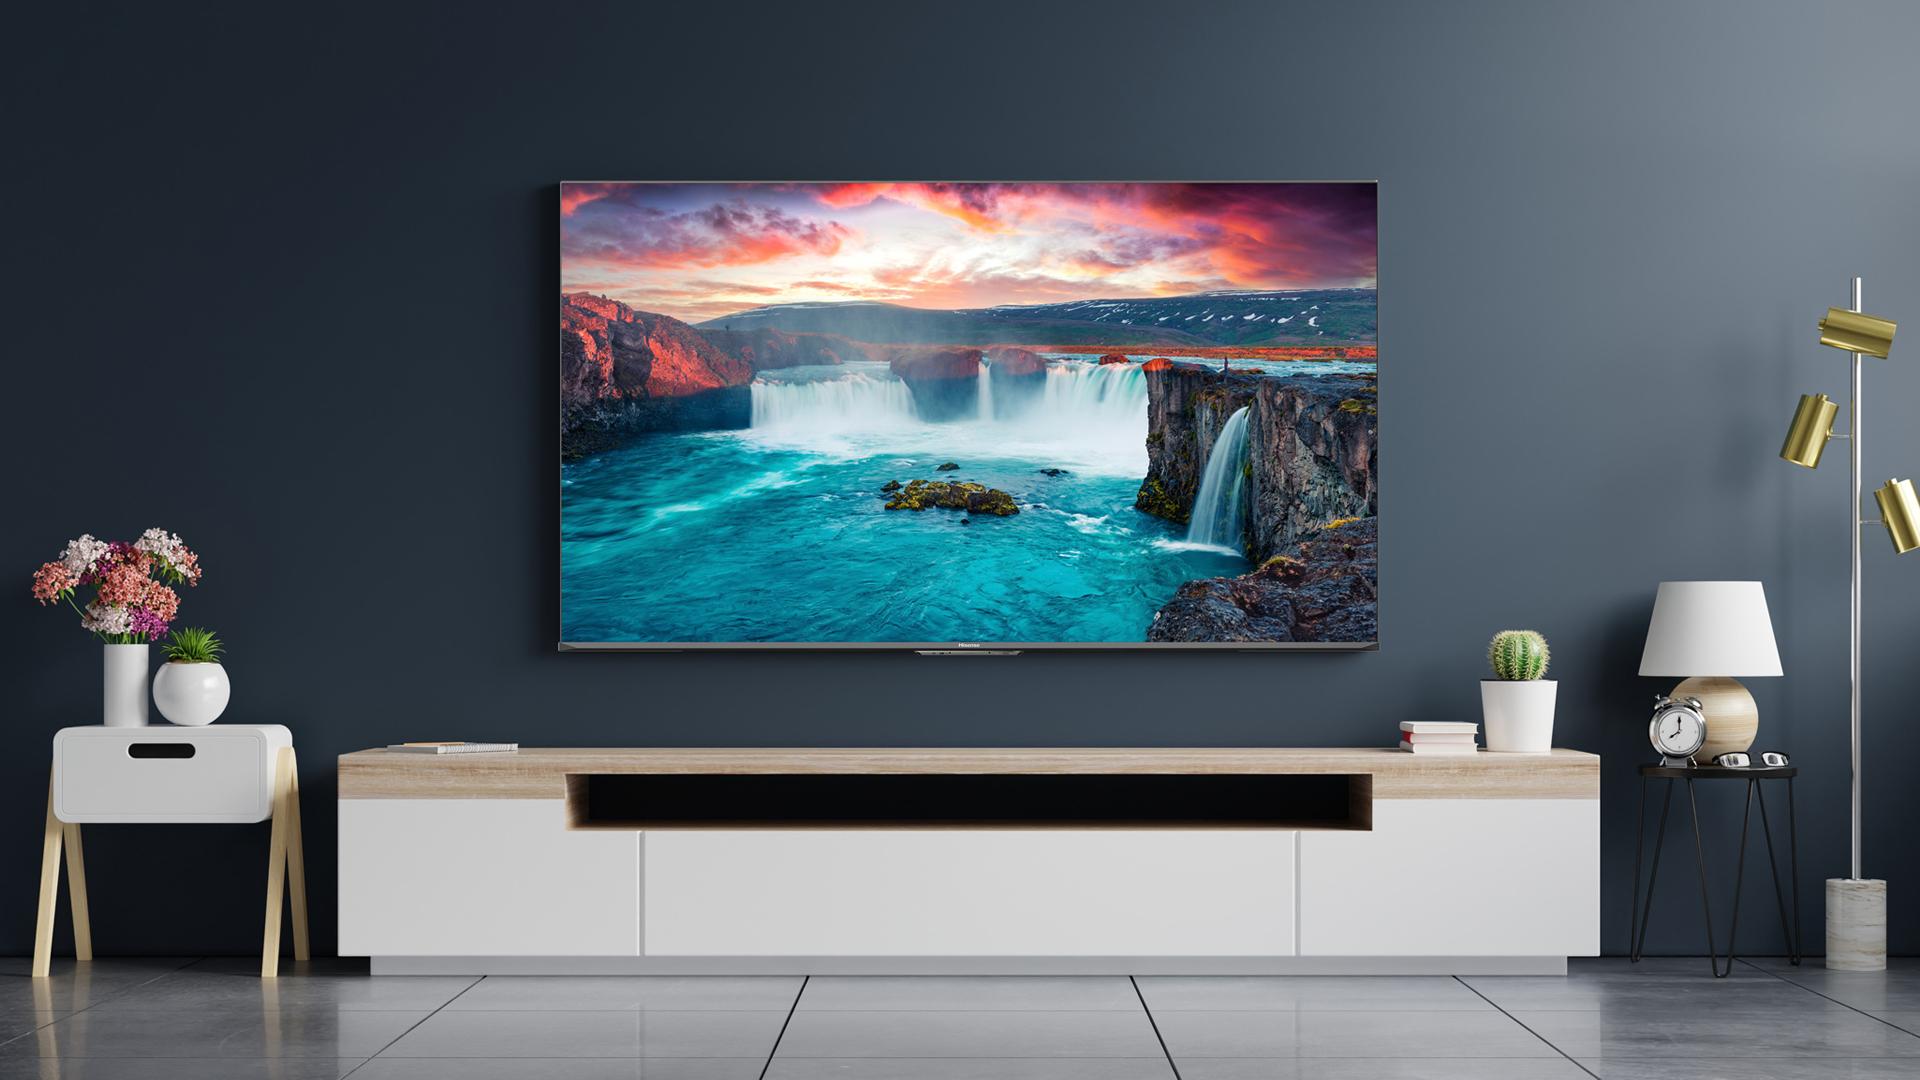 TV Hisense donde comprar